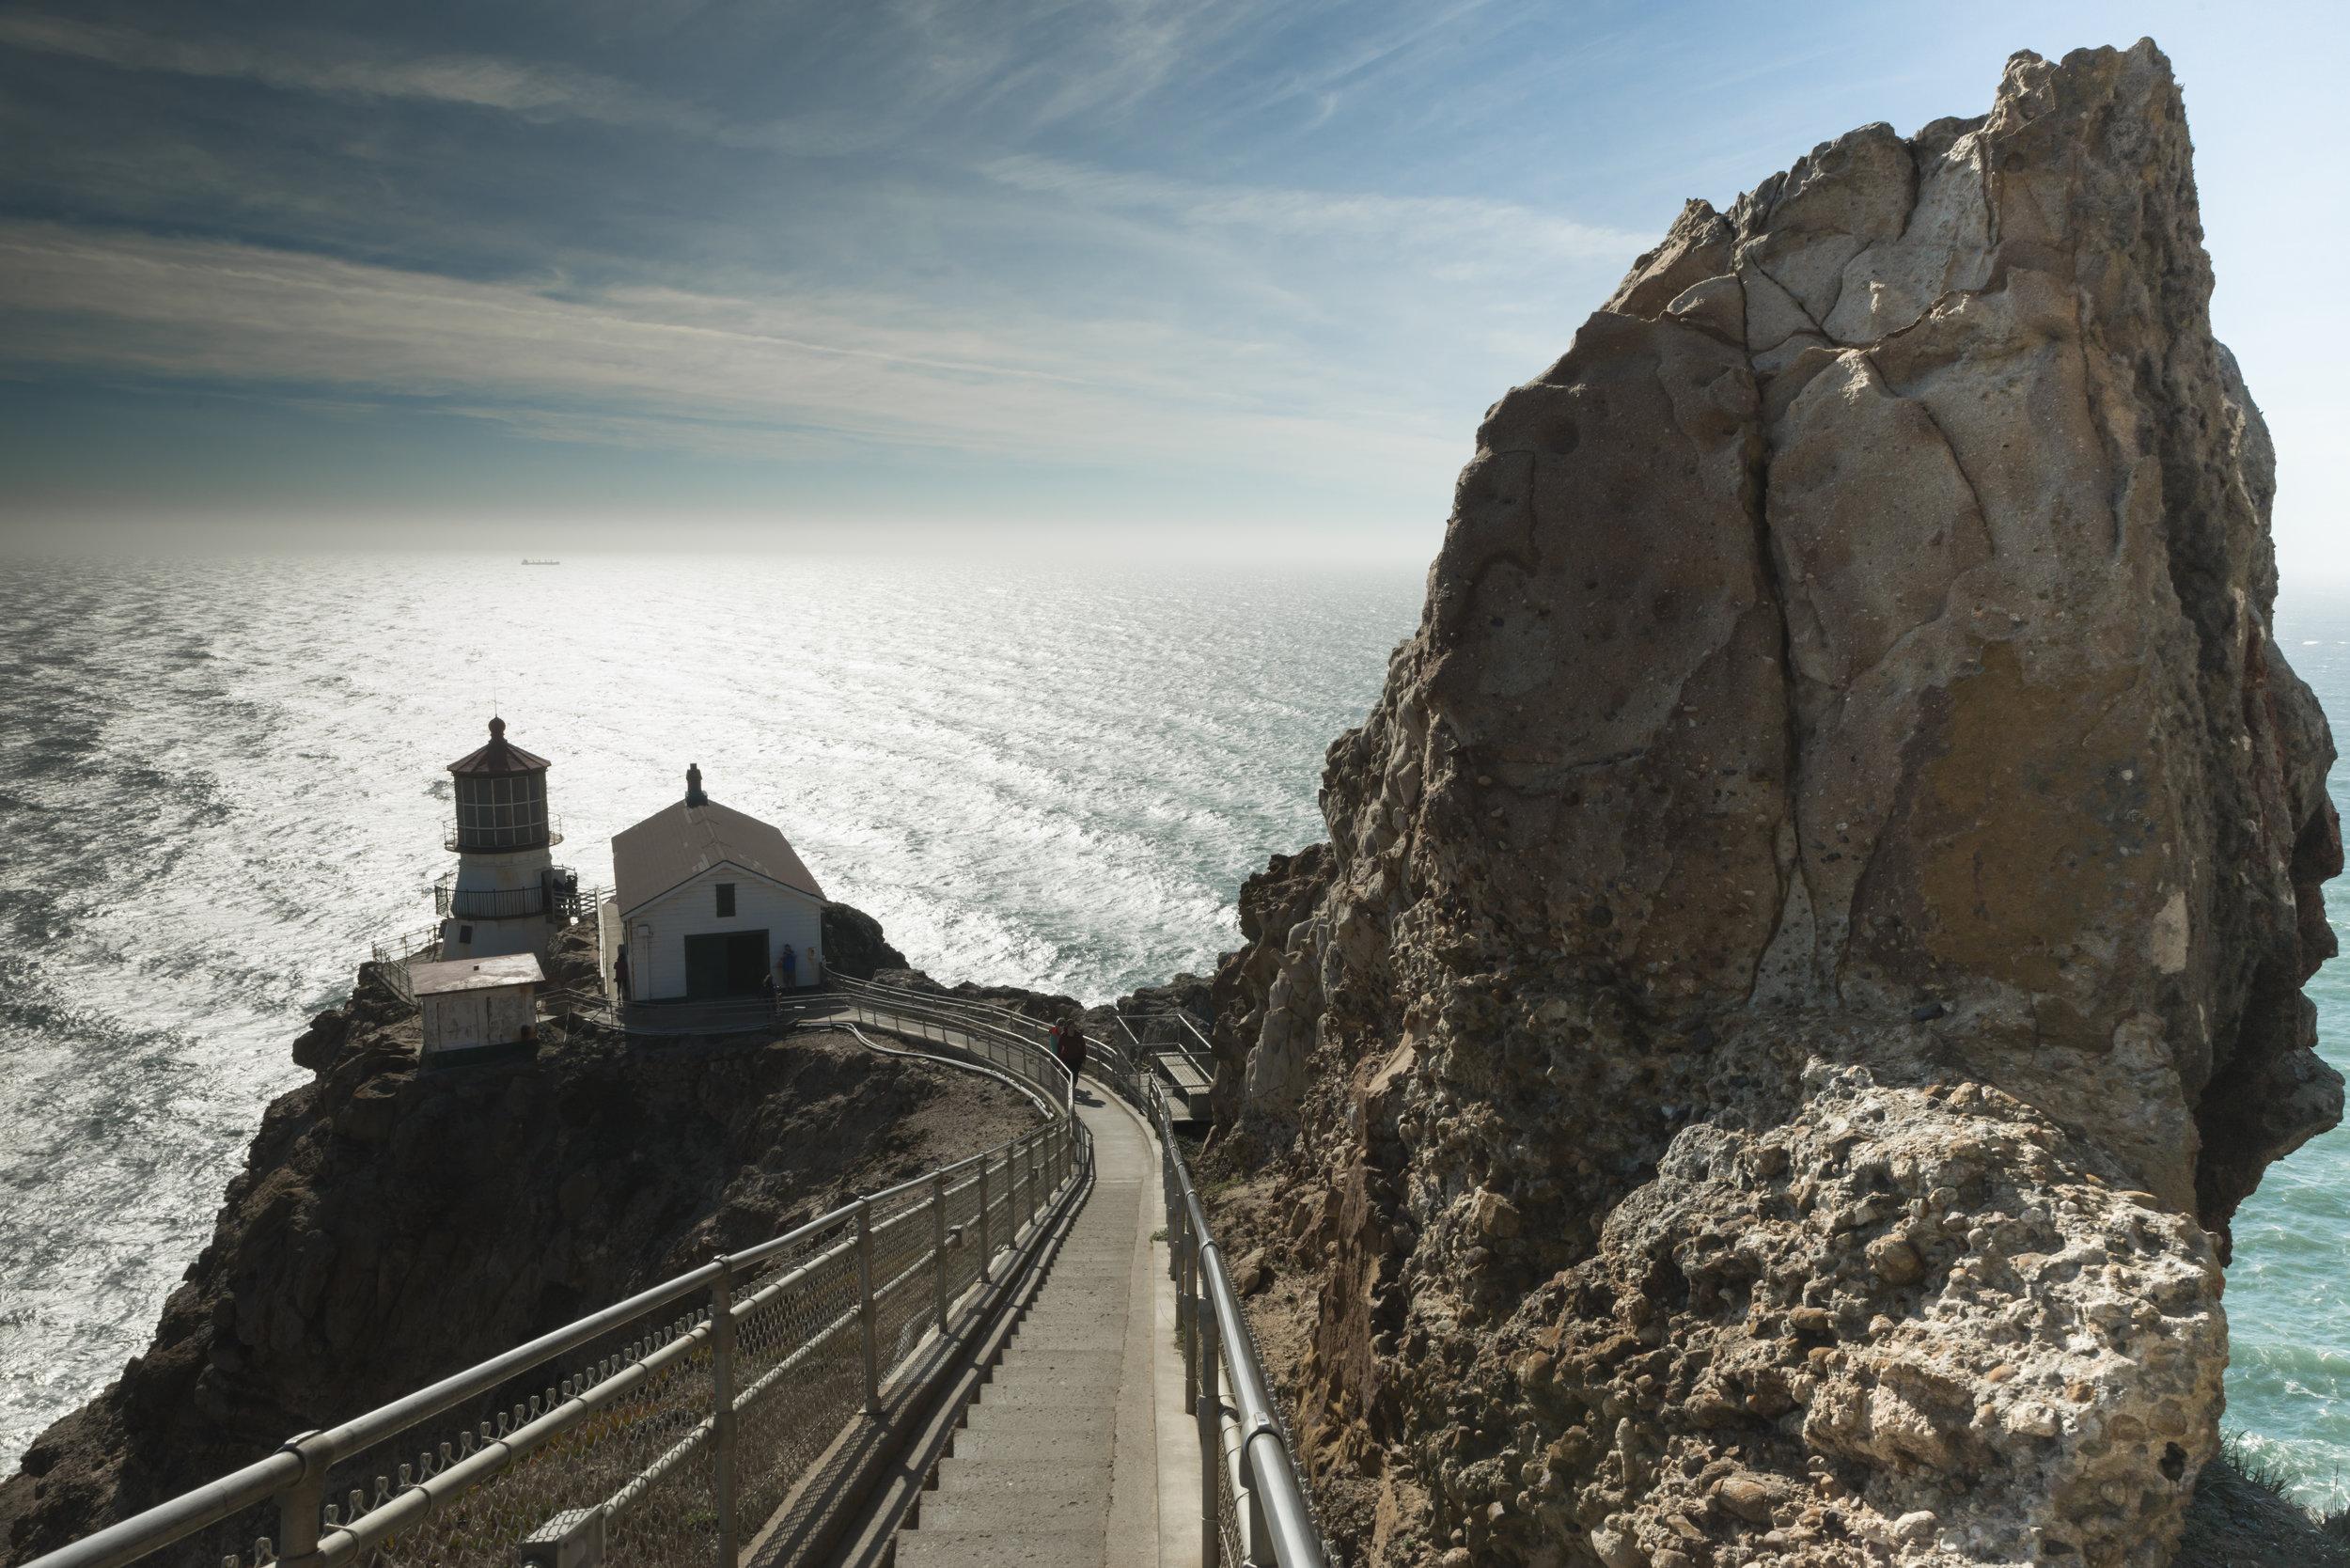 Point Reyes / California